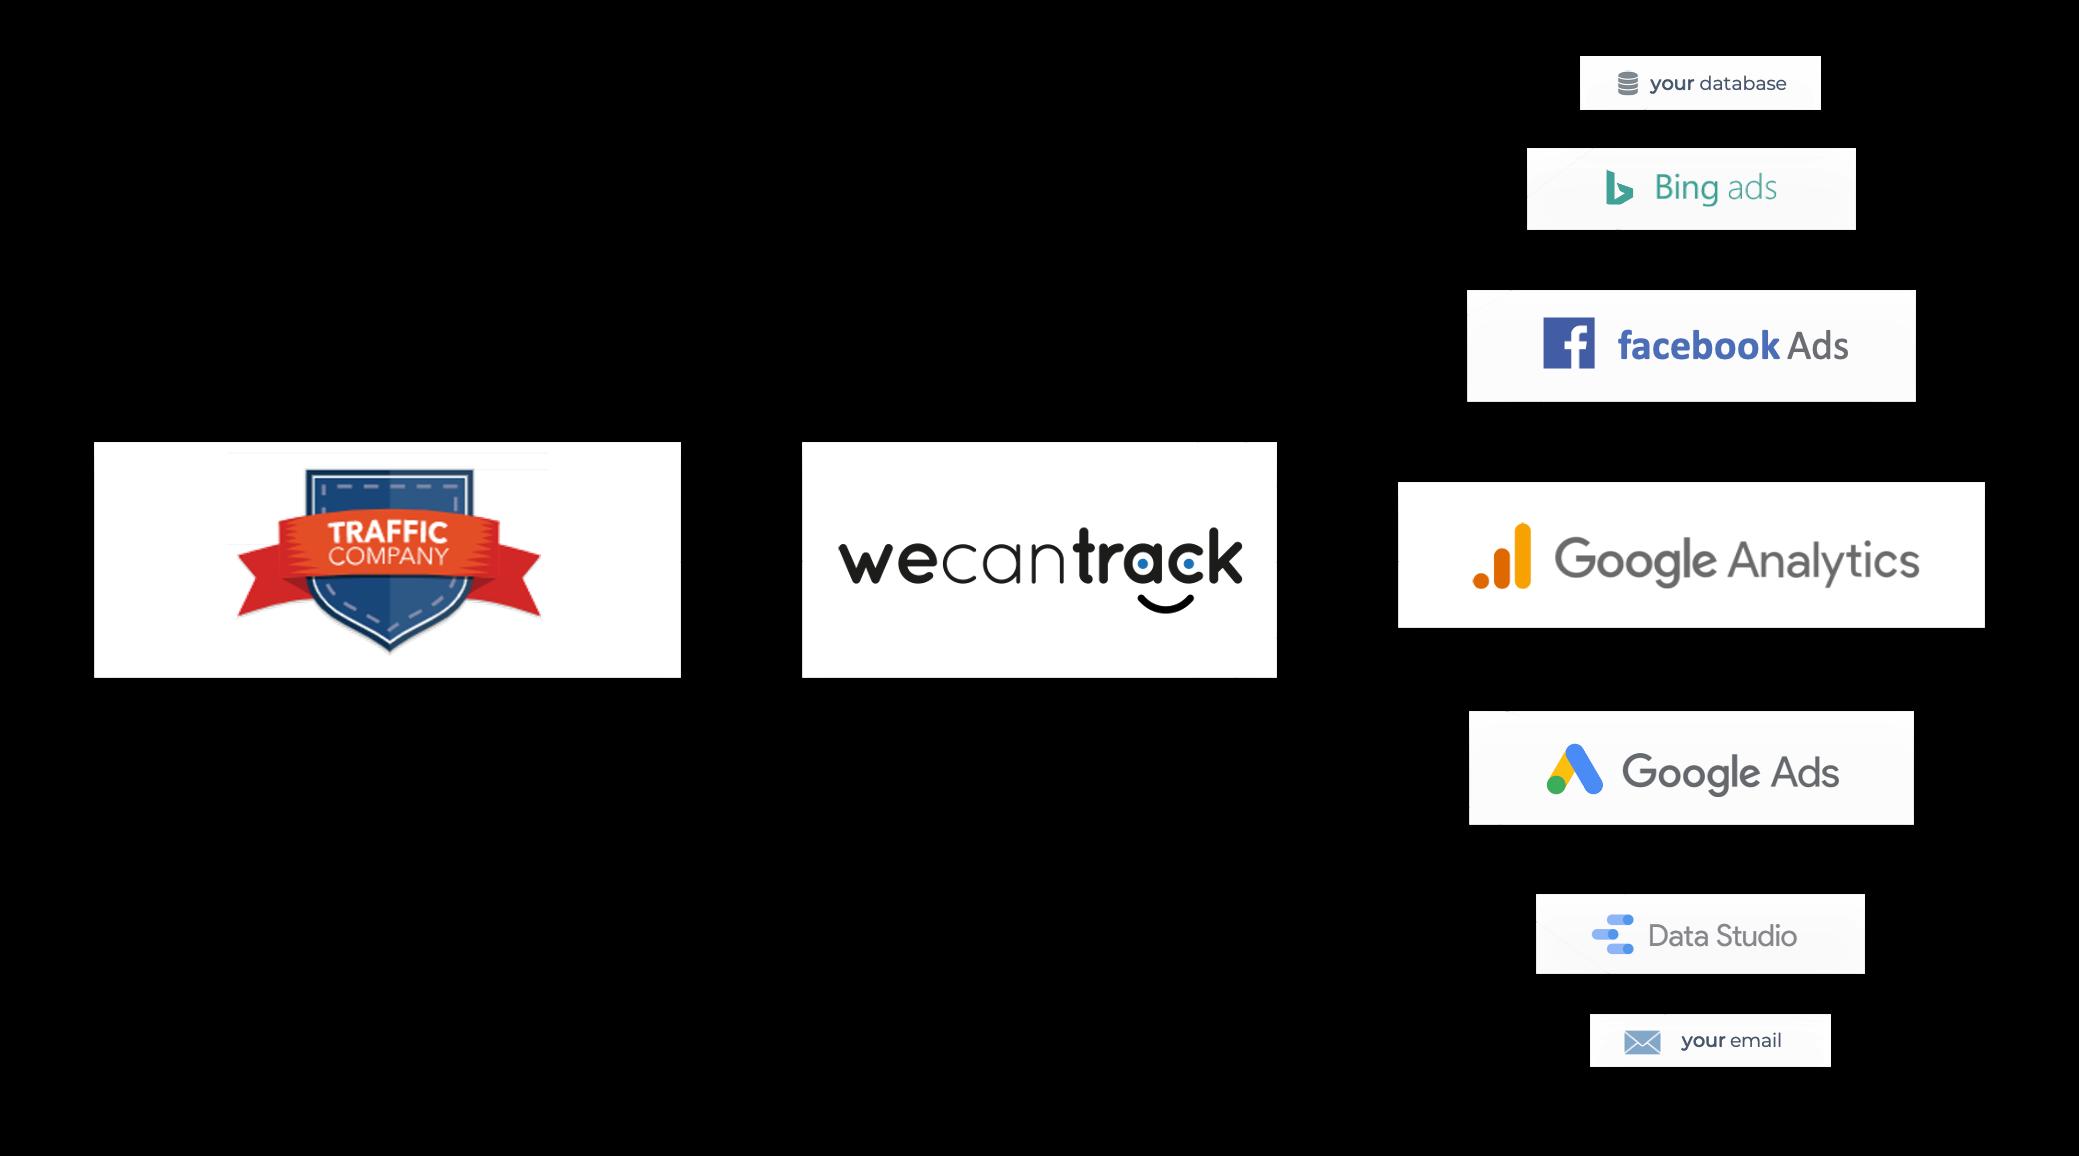 traffic-company-integration-via-postback-url